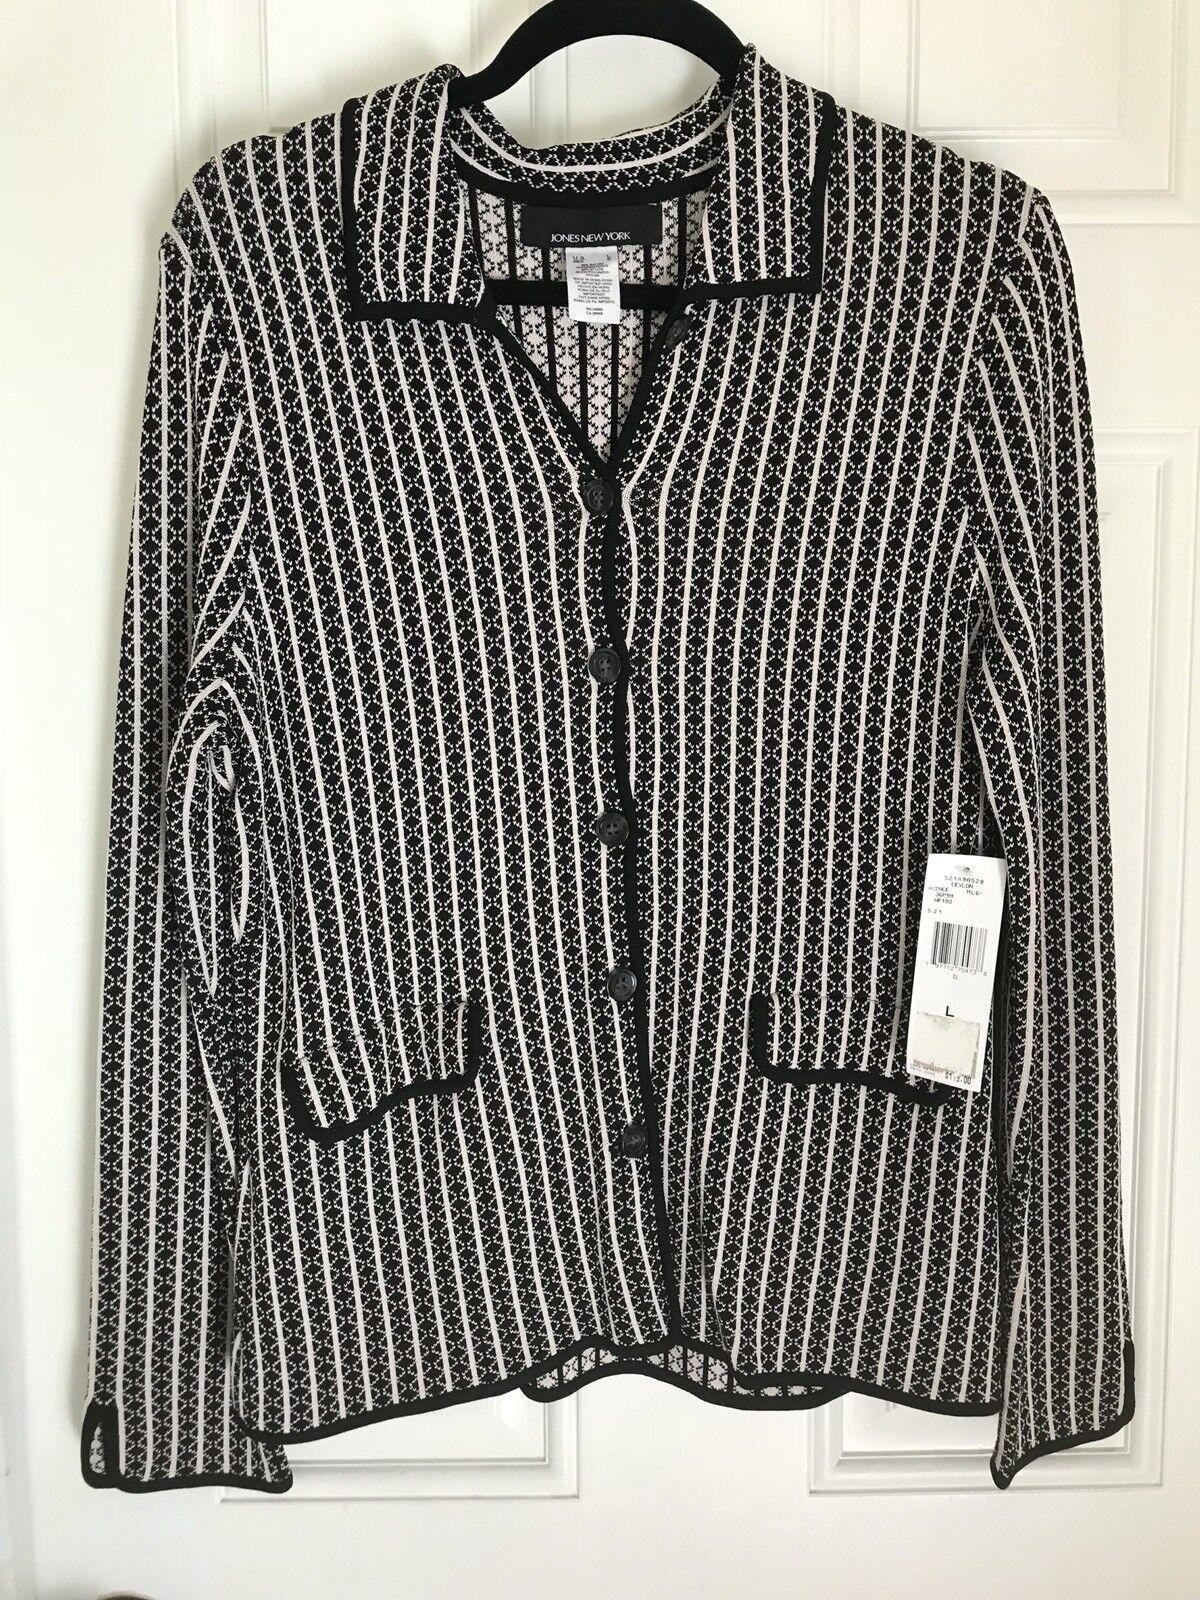 Jones New Yor NWT Button Down Collarot Shirt Jacket schwarz And Weiß Large L